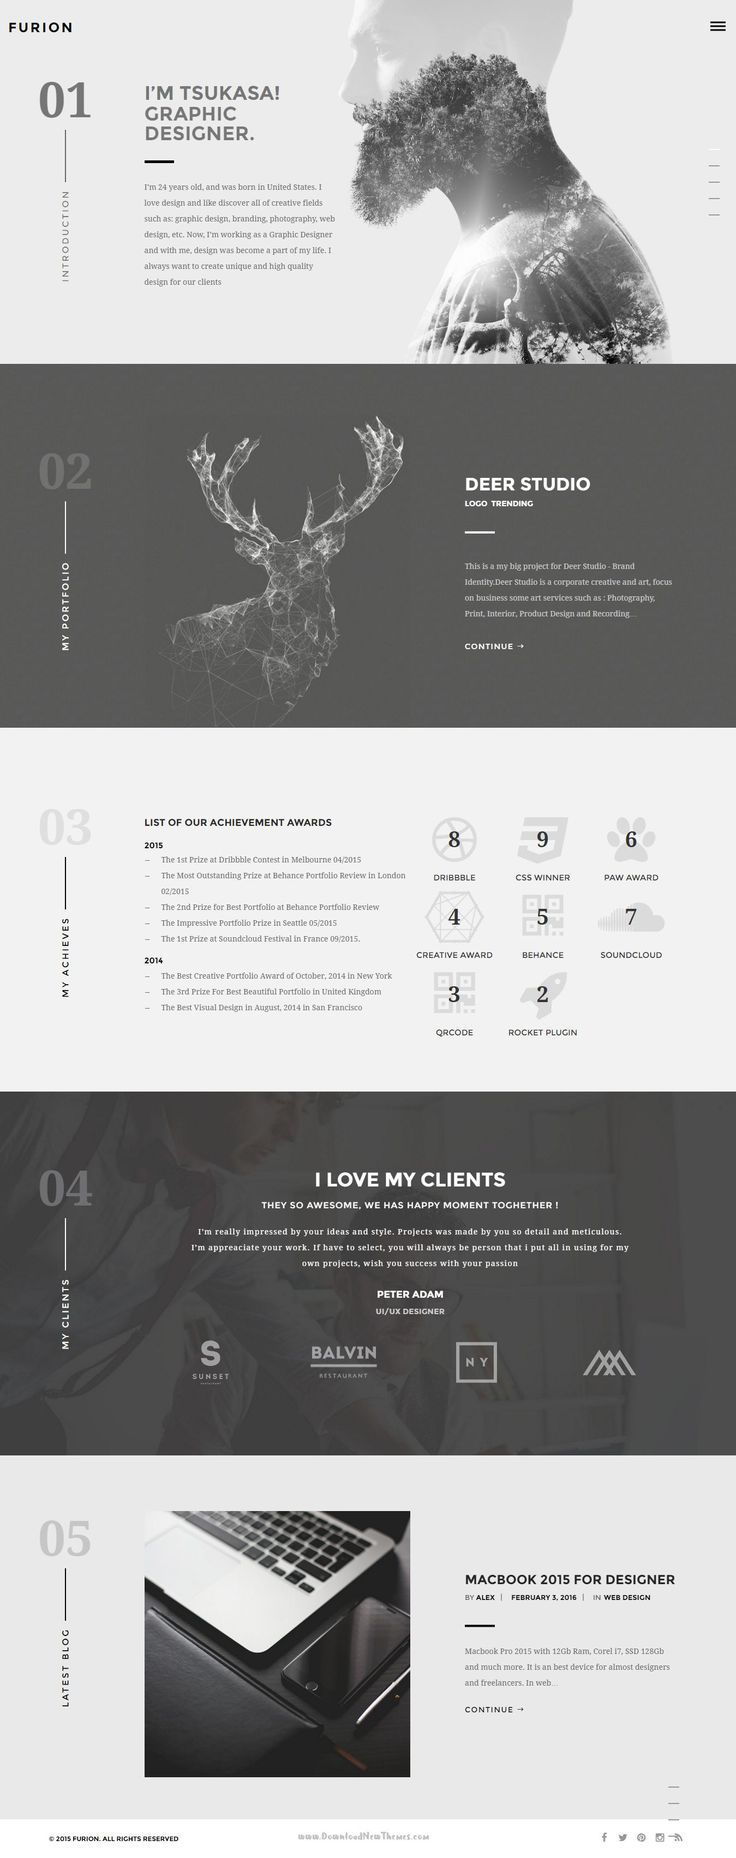 Furion - Creative Blog & Portfolio WordPress Theme> Es ist speziell… - #amp #Blog #Creative #Es #Furion #ist #portfolio #speziell #Themegt #WordPress #interfacedesign